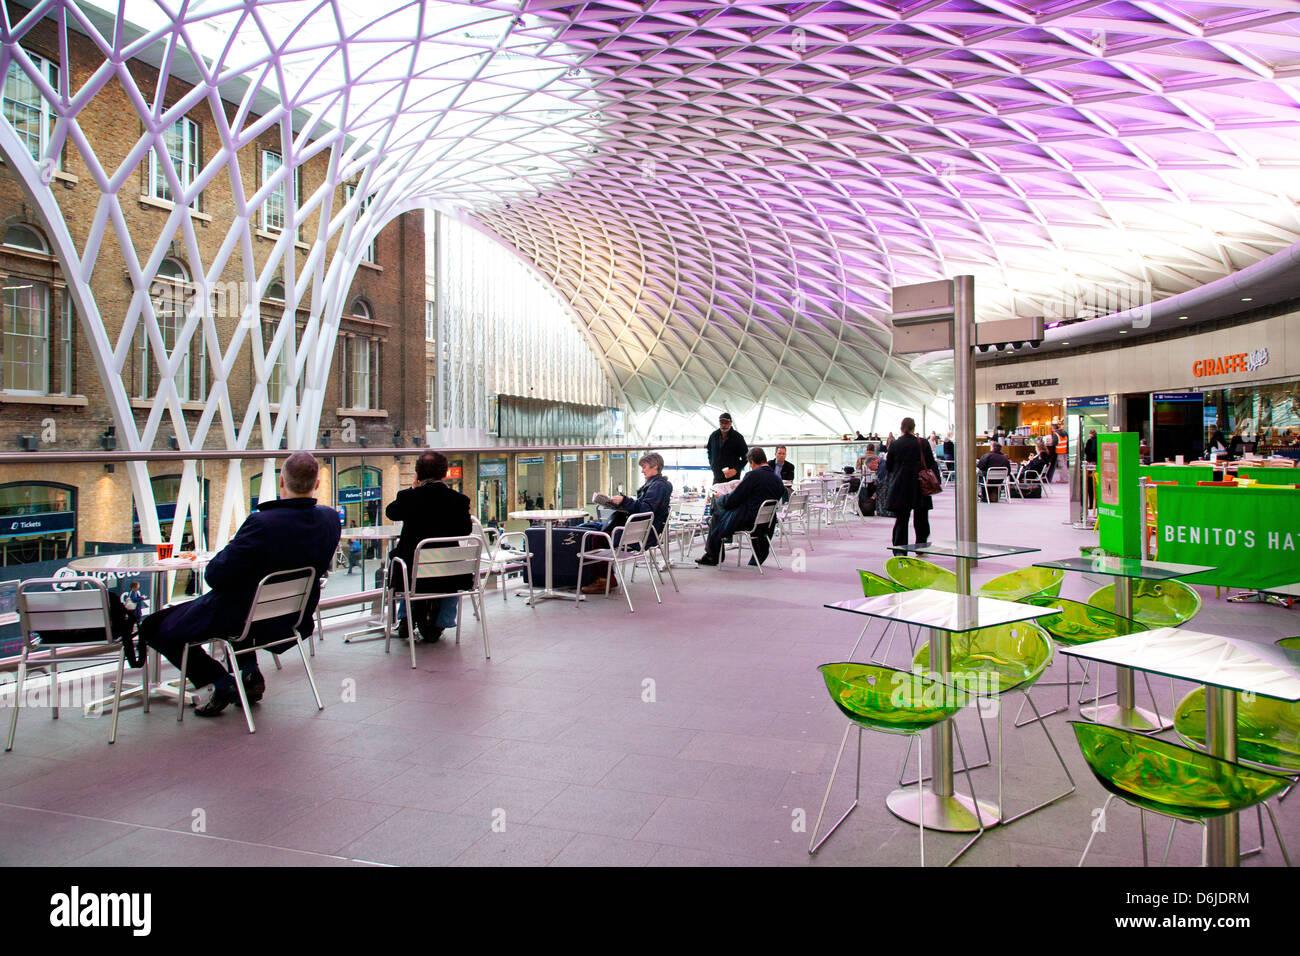 Kings Cross Rail Station, London, England, United Kingdom, Europe - Stock Image